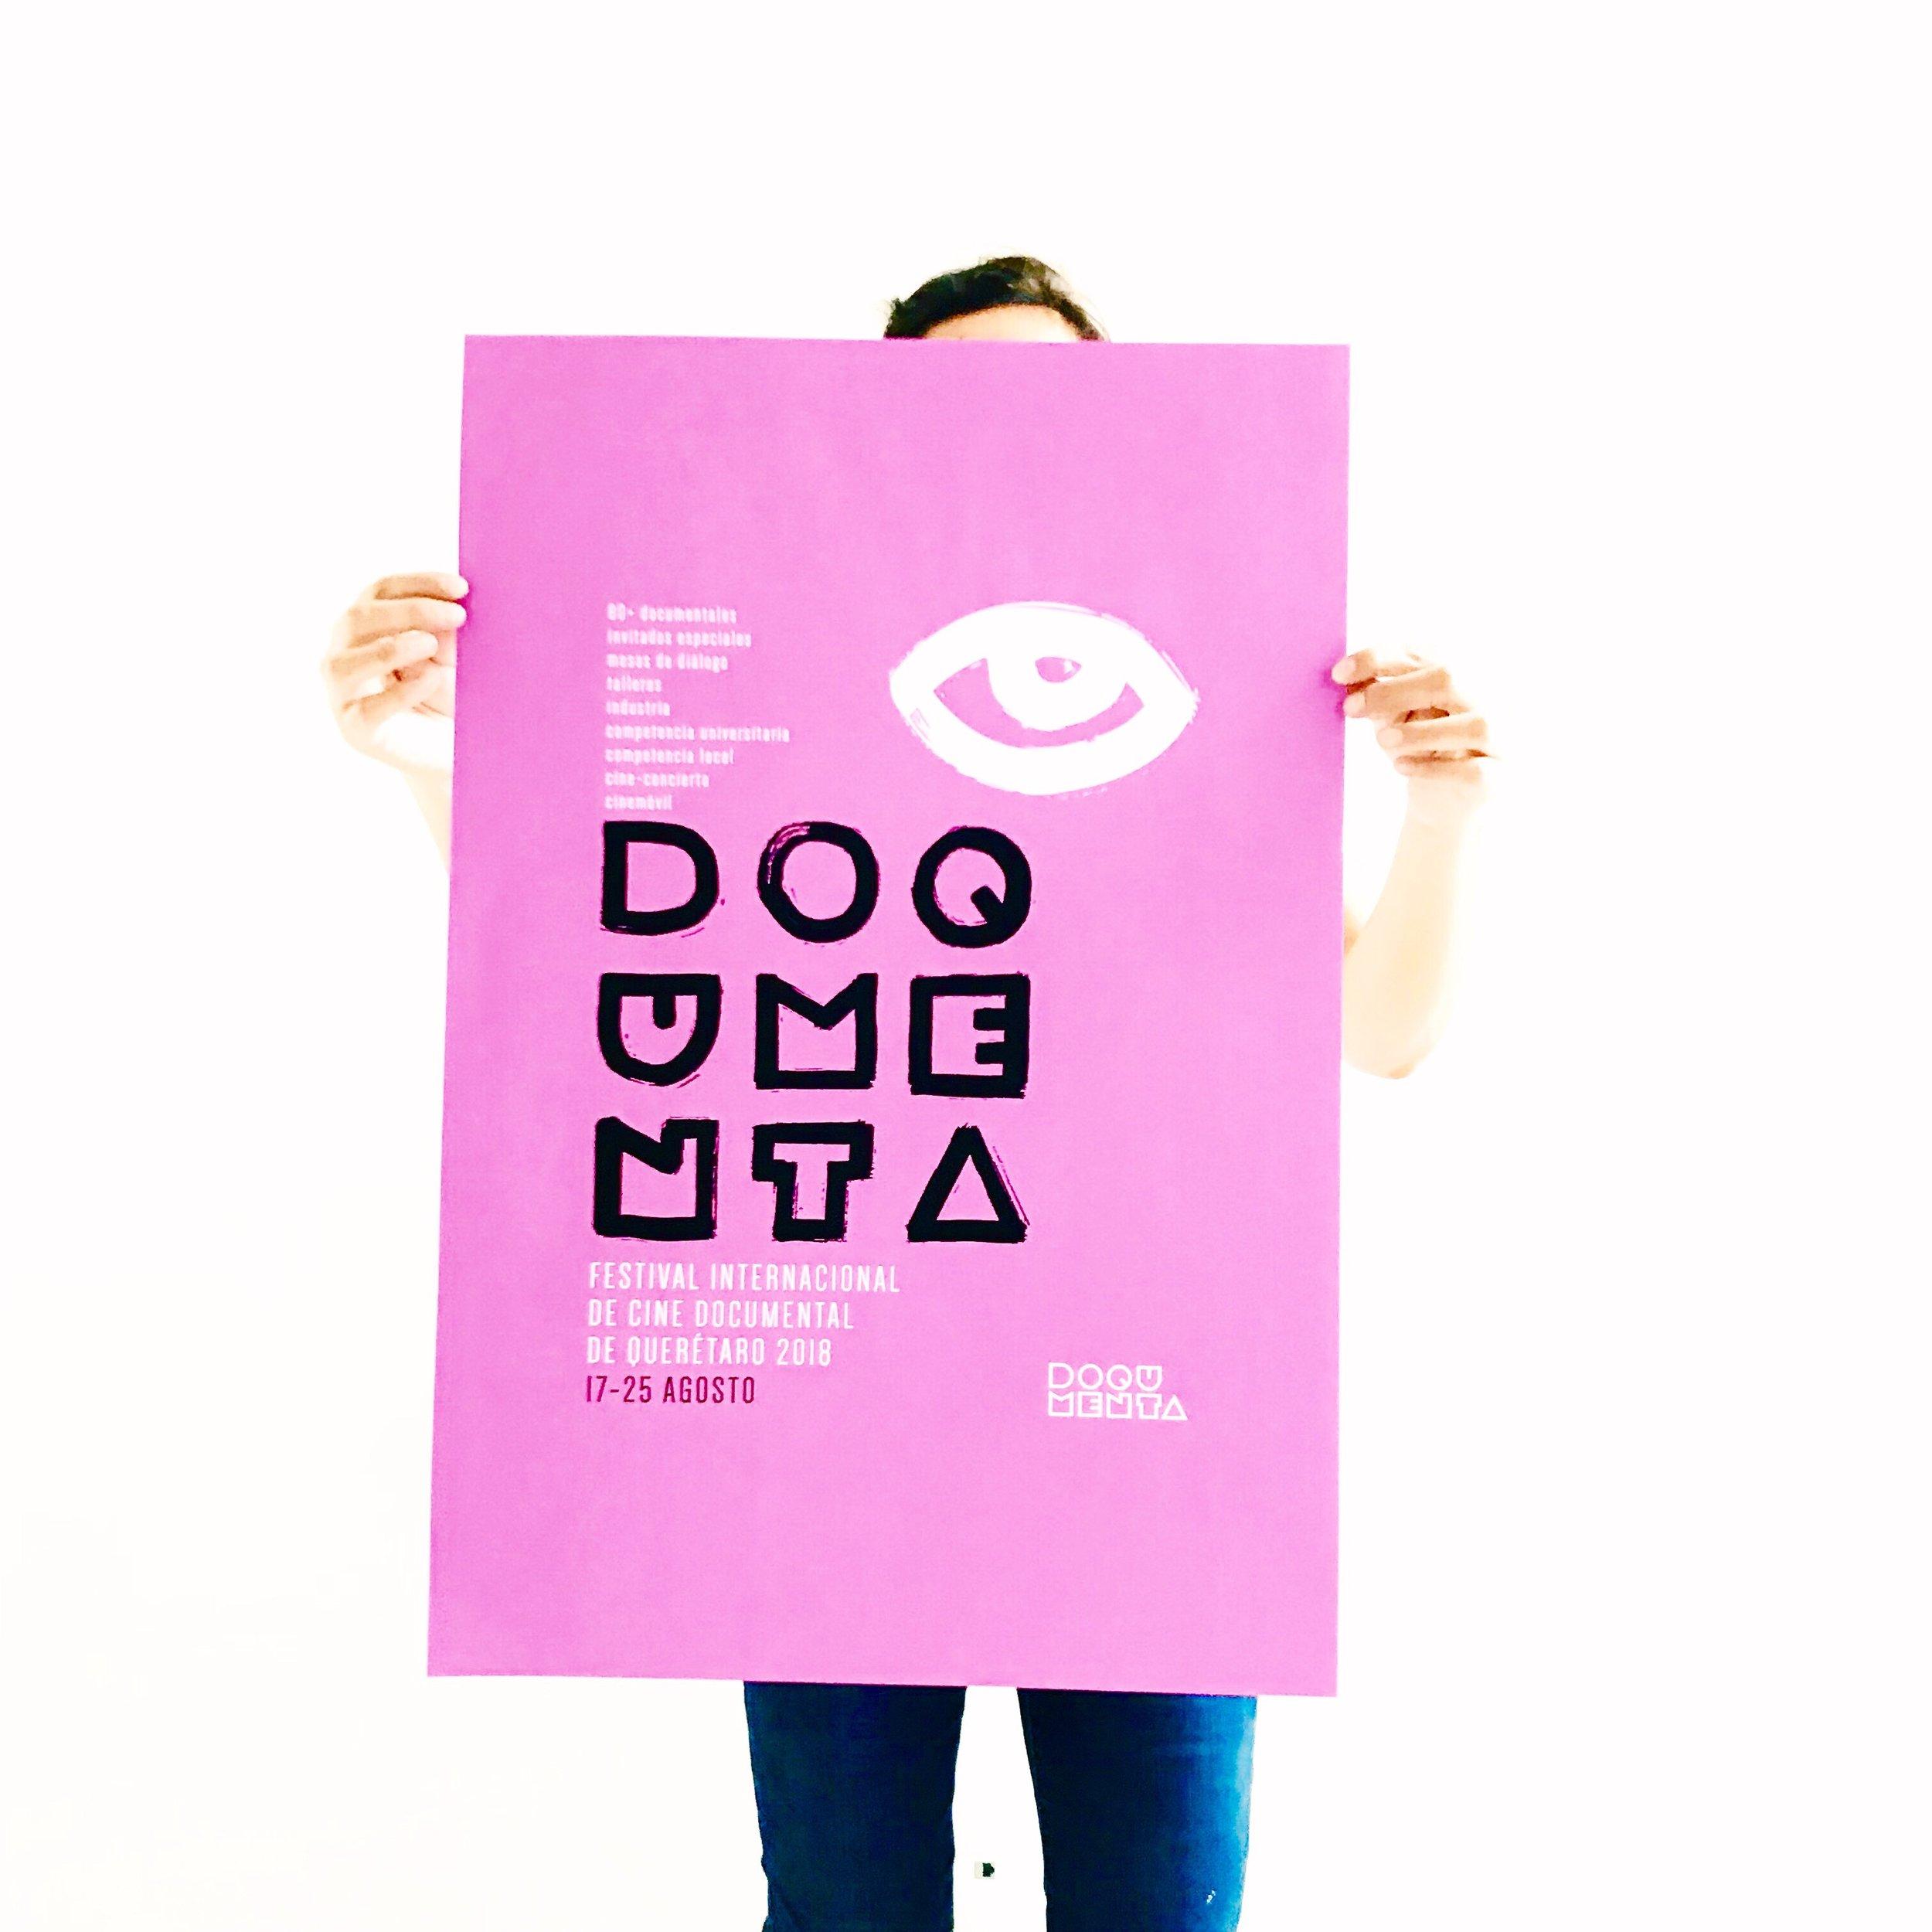 Branding DOQUMENTA 2018